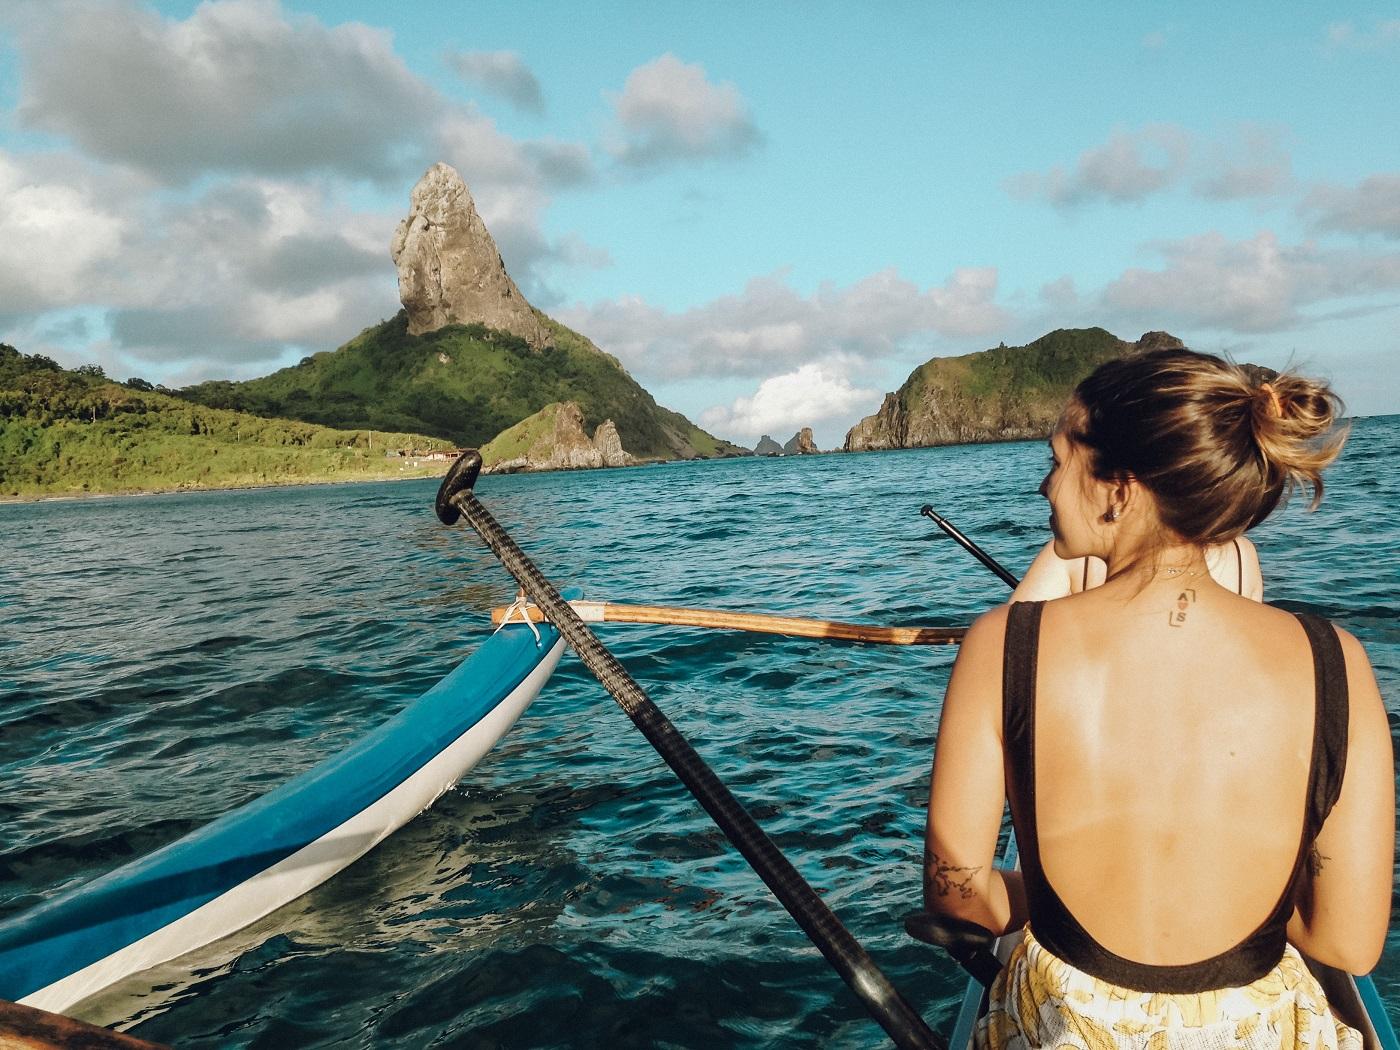 Passeio de canoa havaiana (Foto: Tati Sisti)